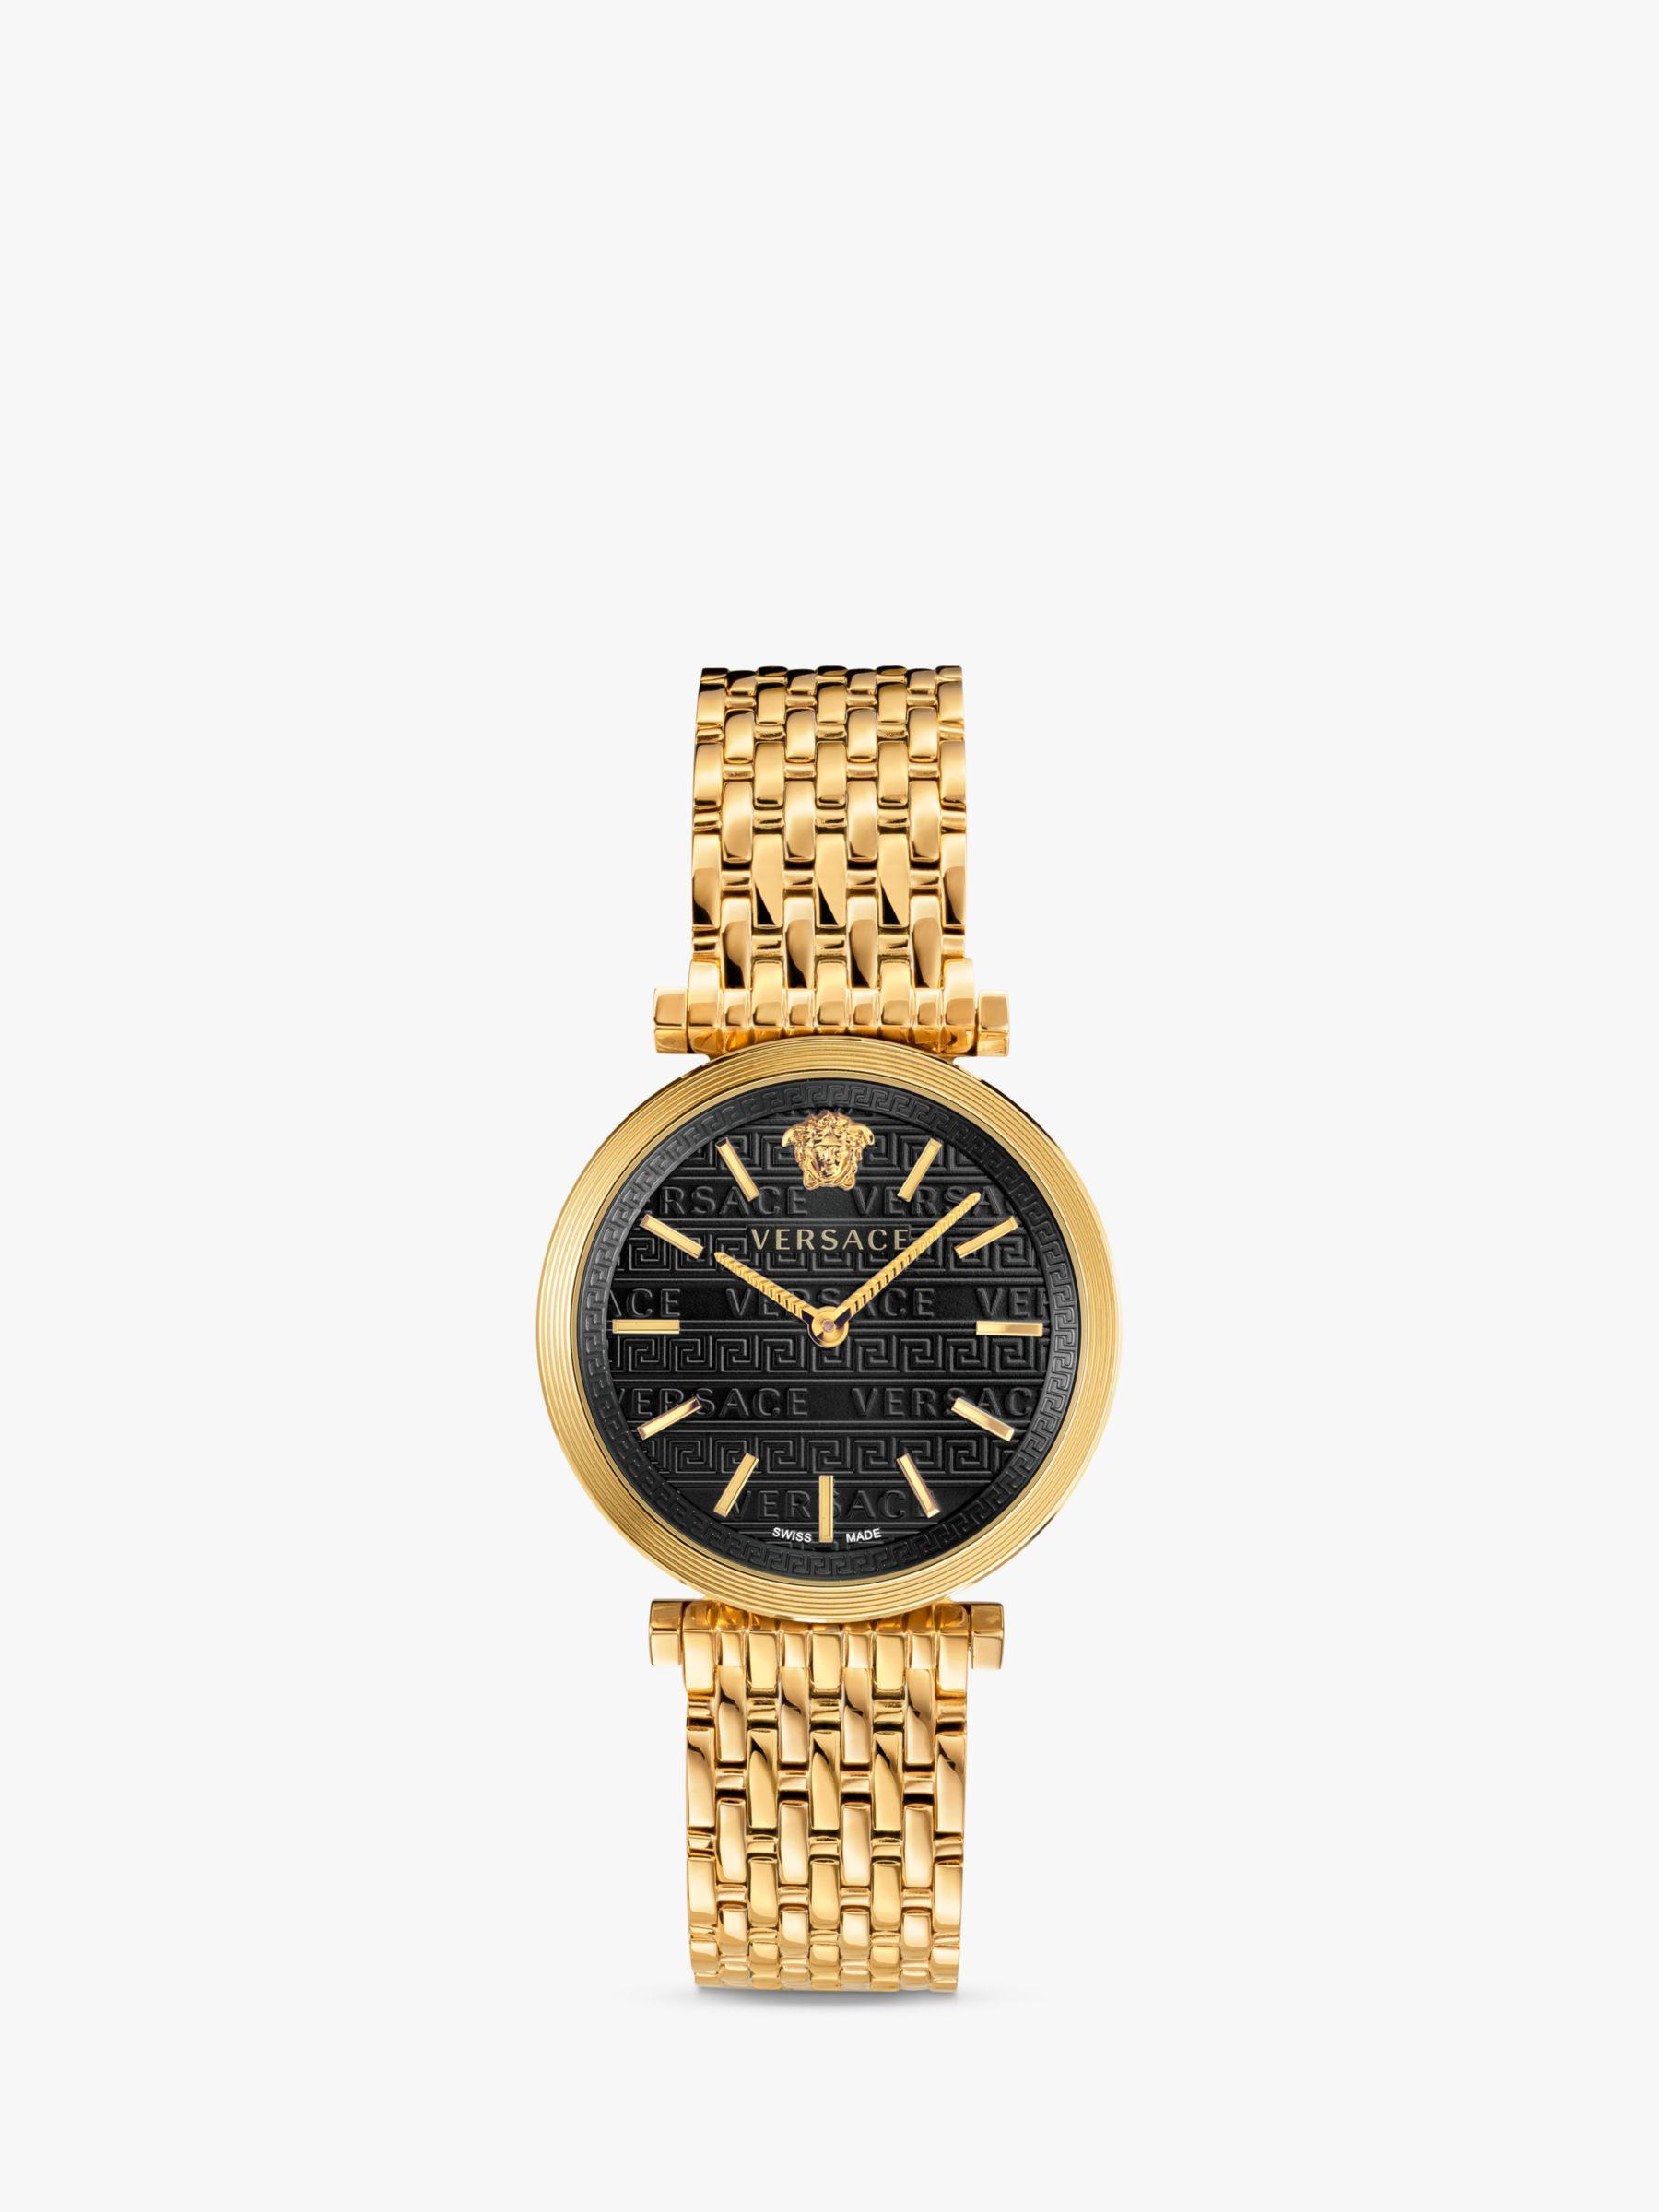 Versace Versace VELS00819 Women's Twist Bracelet Strap Watch, Gold/Black